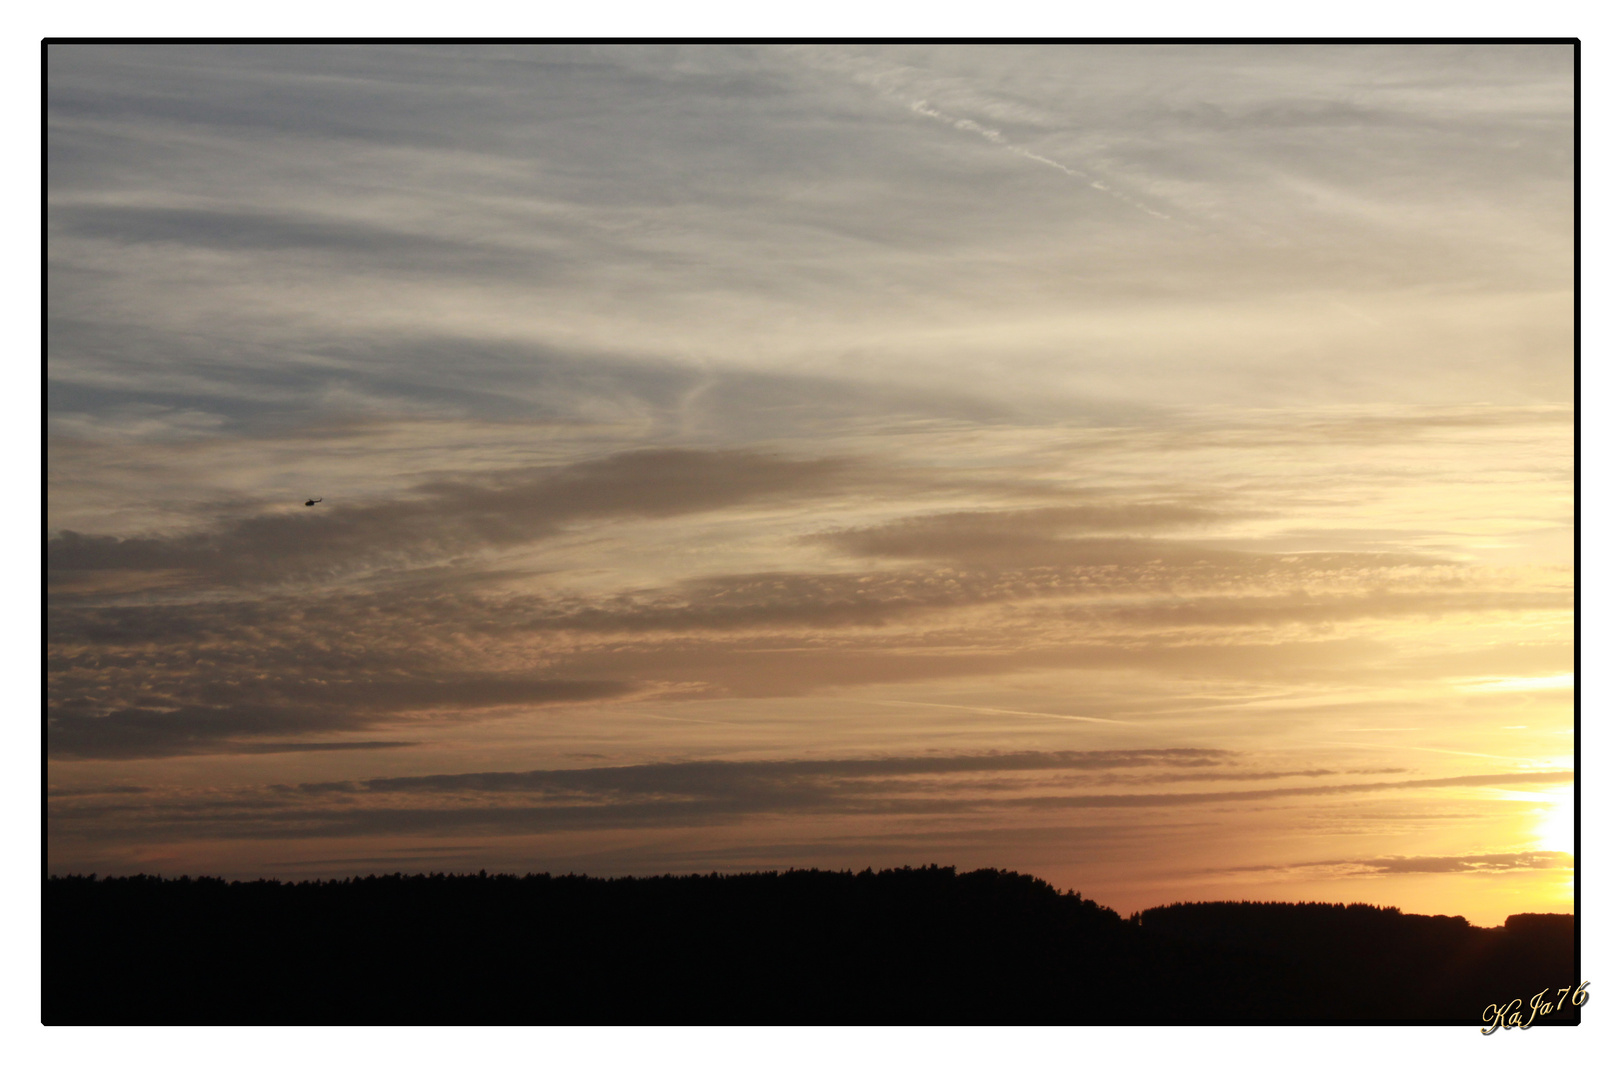 Sonnenuntergang in Nideggen